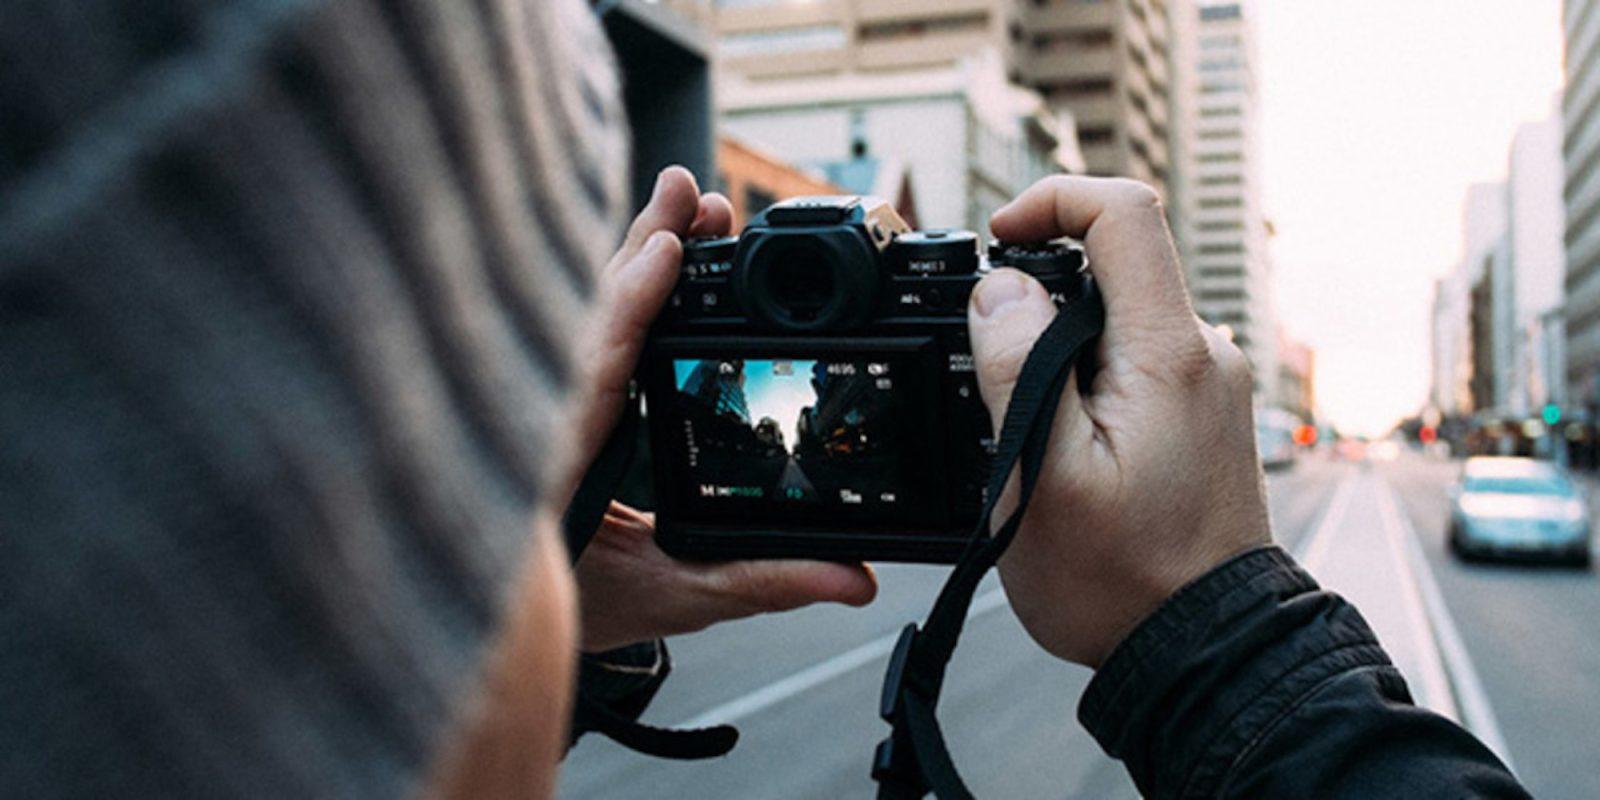 Buy Adobe's CC Photography Plan & get a bonus $25 gift card: $120 ($145 value)